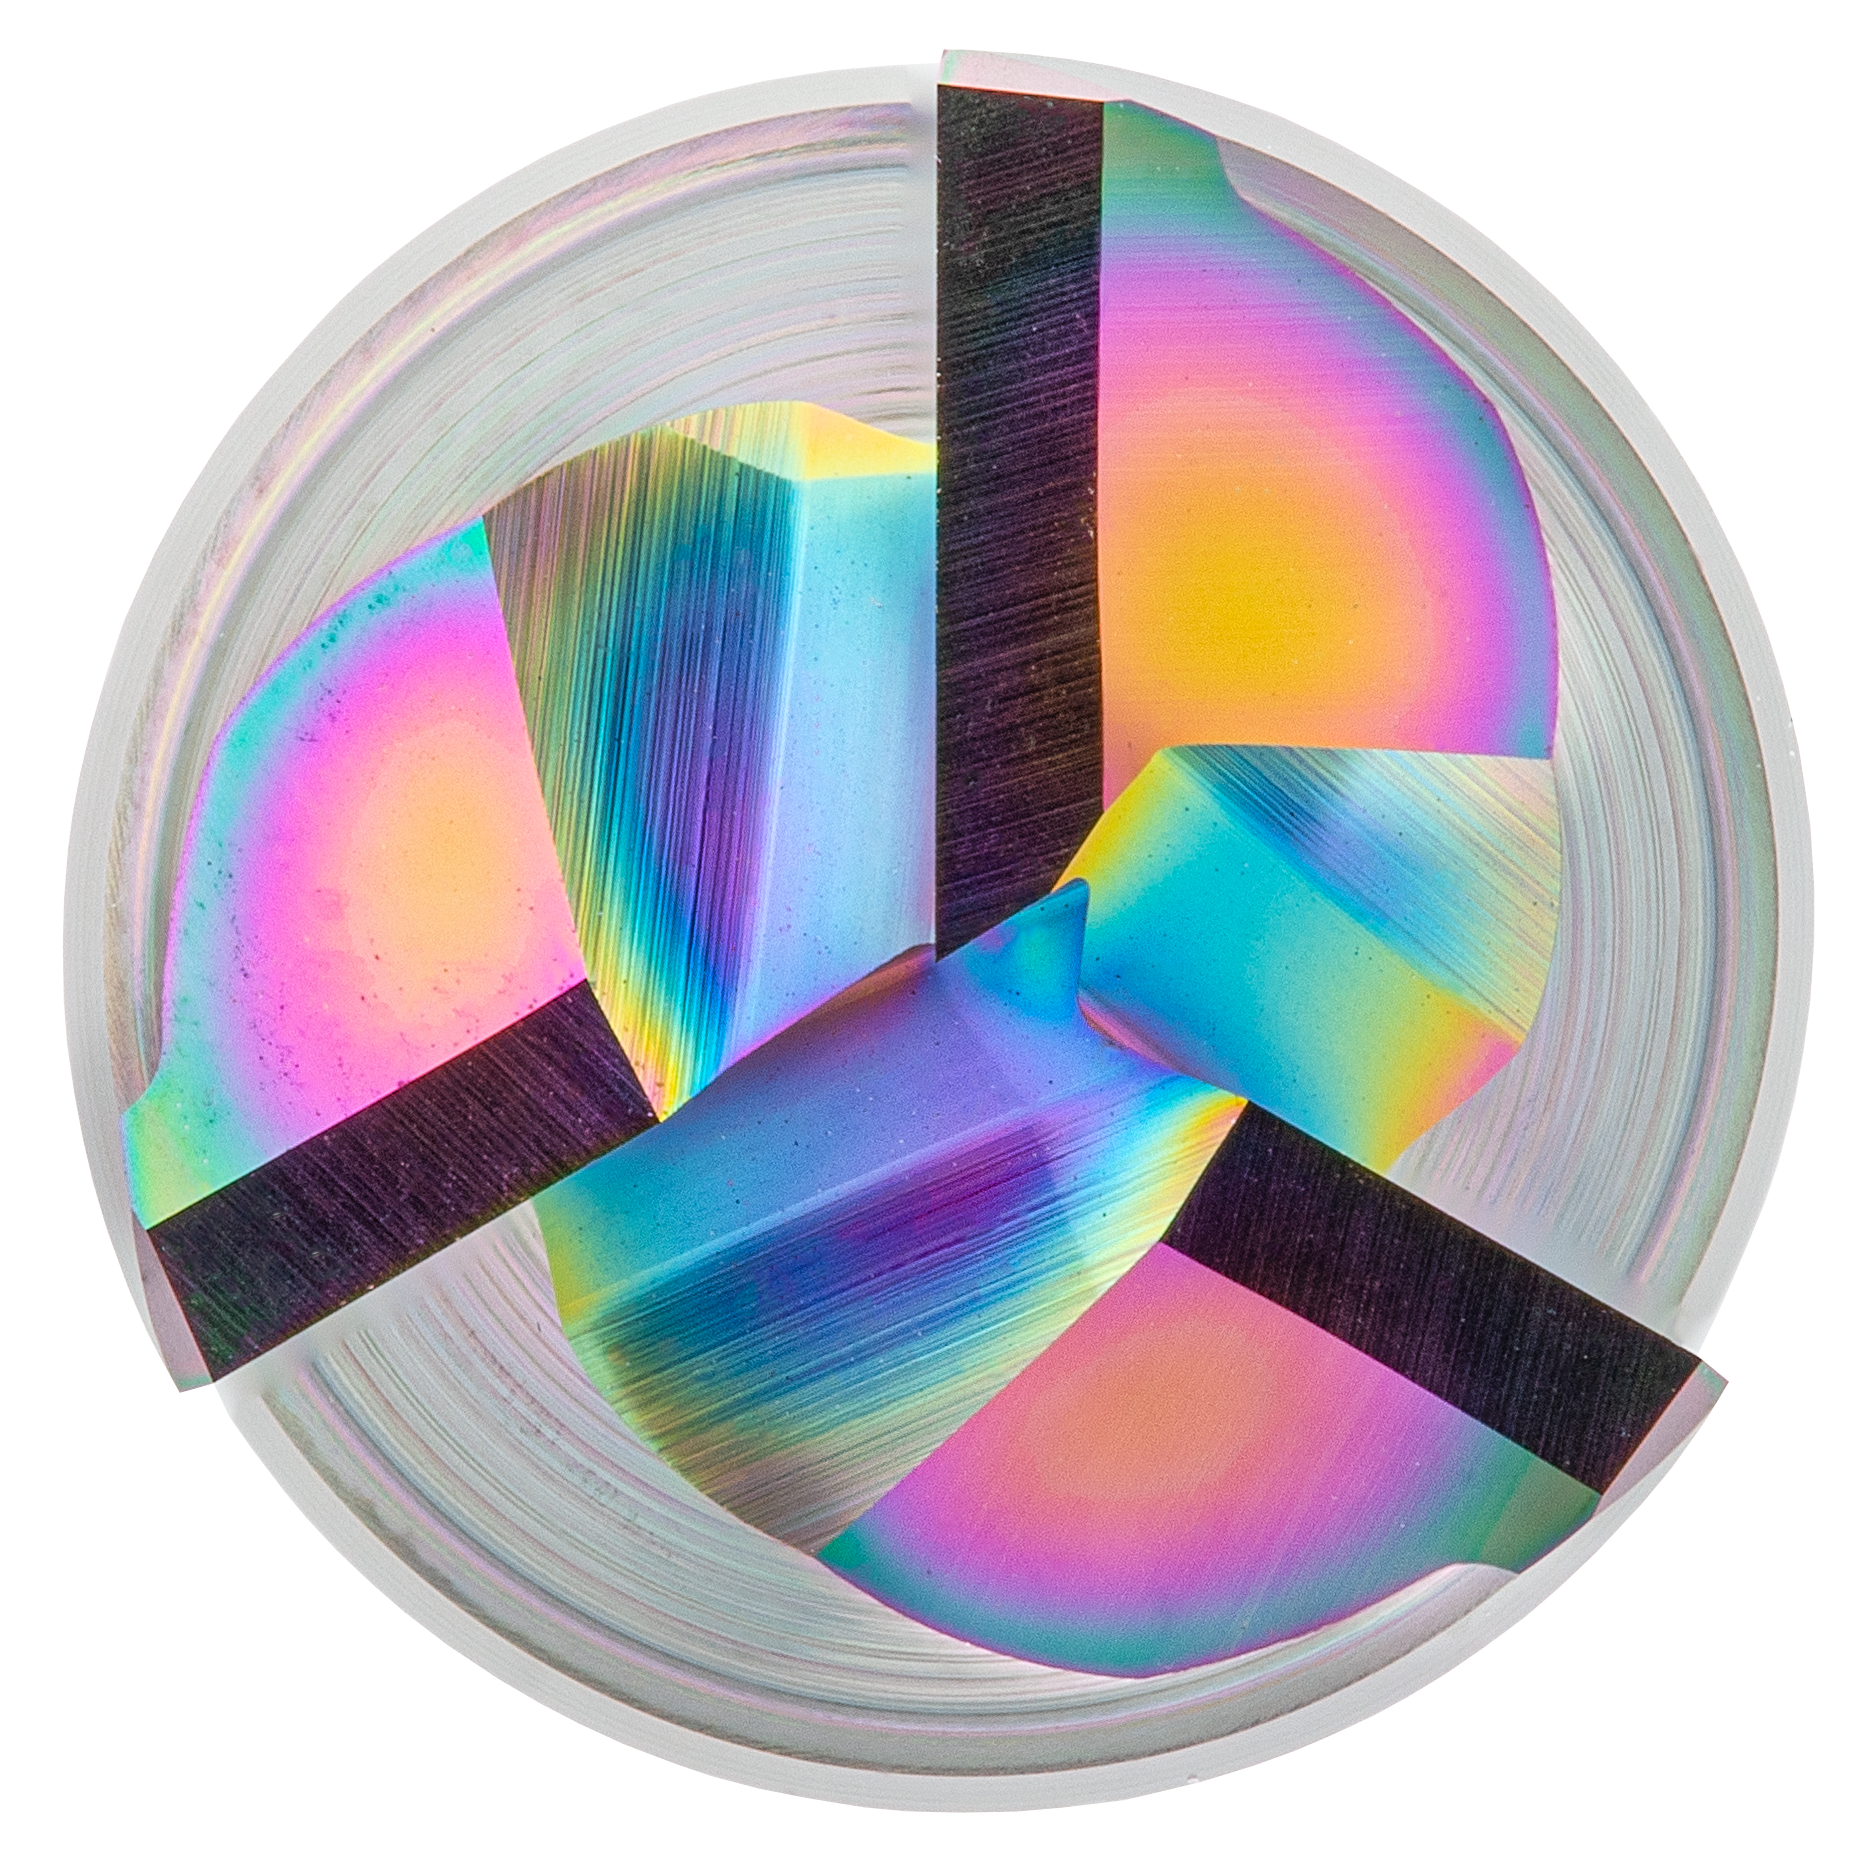 EXN1-M01-0113